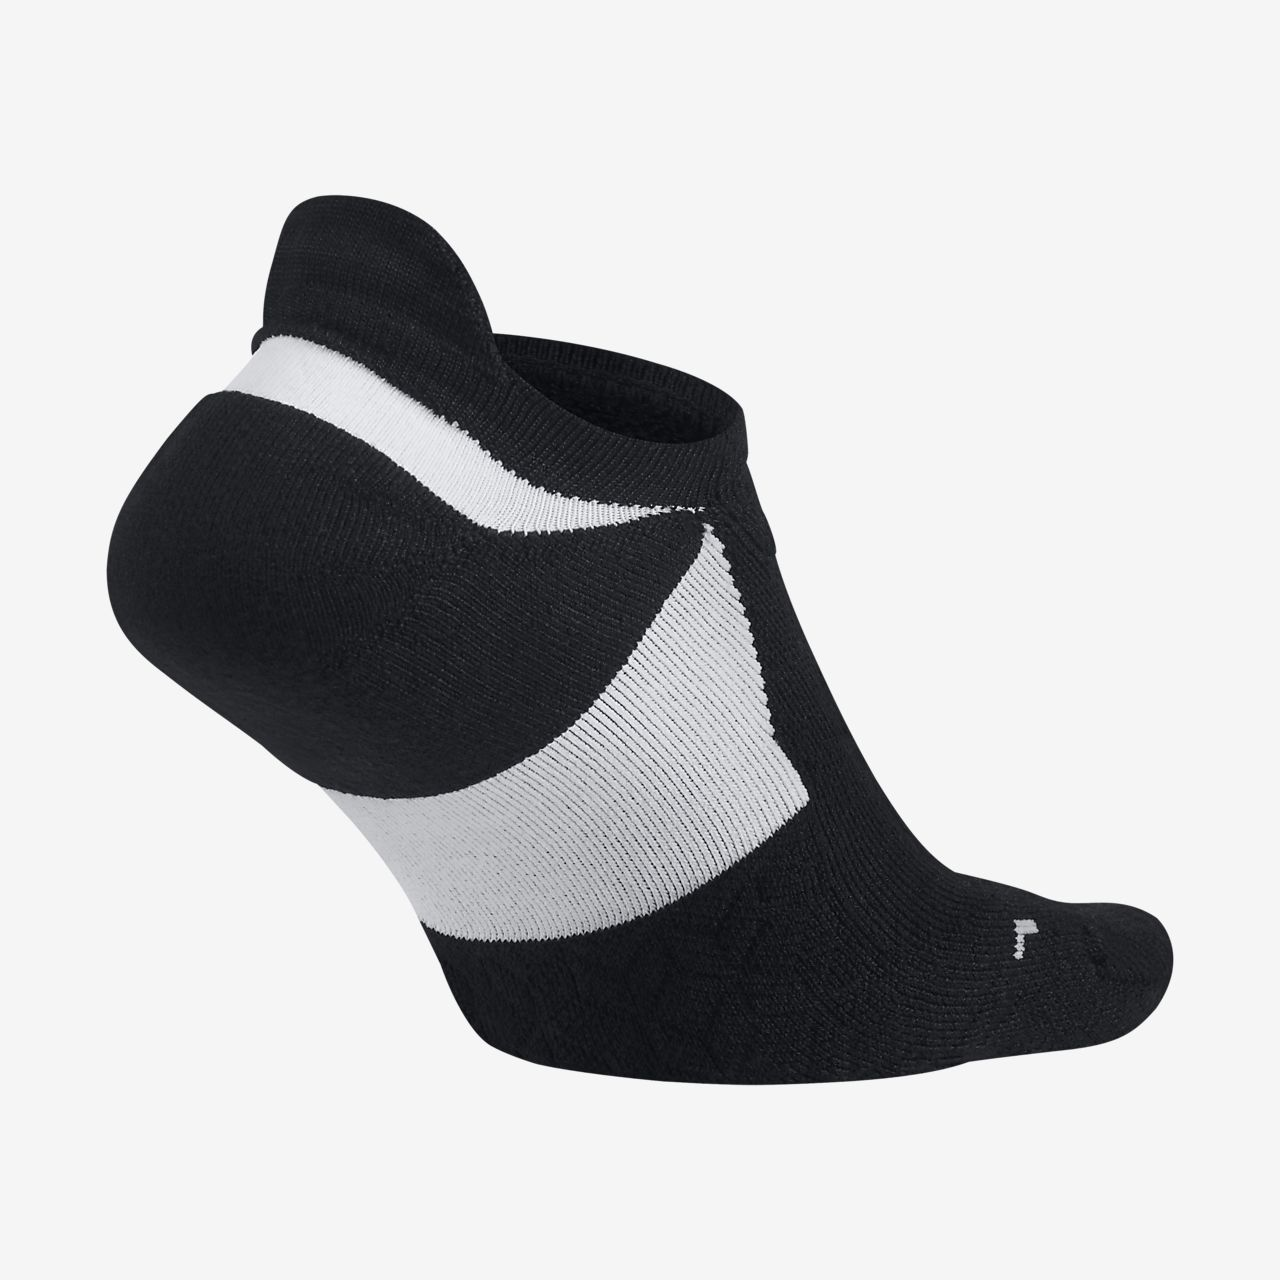 Nike Elite Cushioned No-Show Calcetines de running